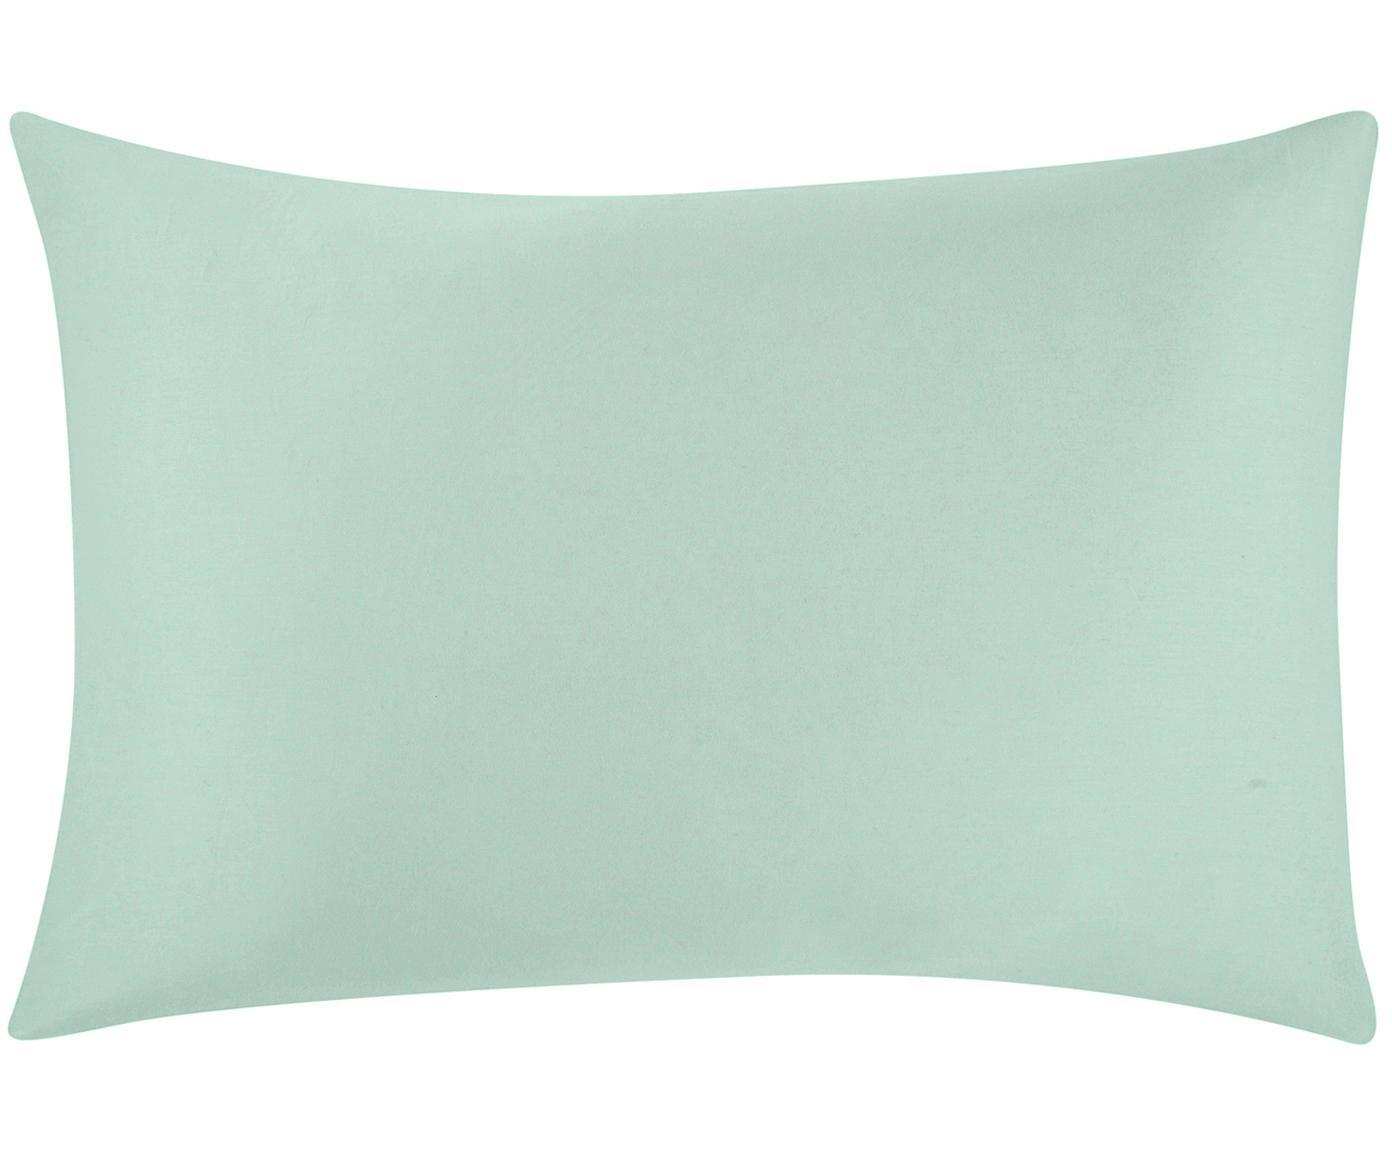 Funda de almohada de satén Comfort, Verde salvia, An 50 x L 70 cm